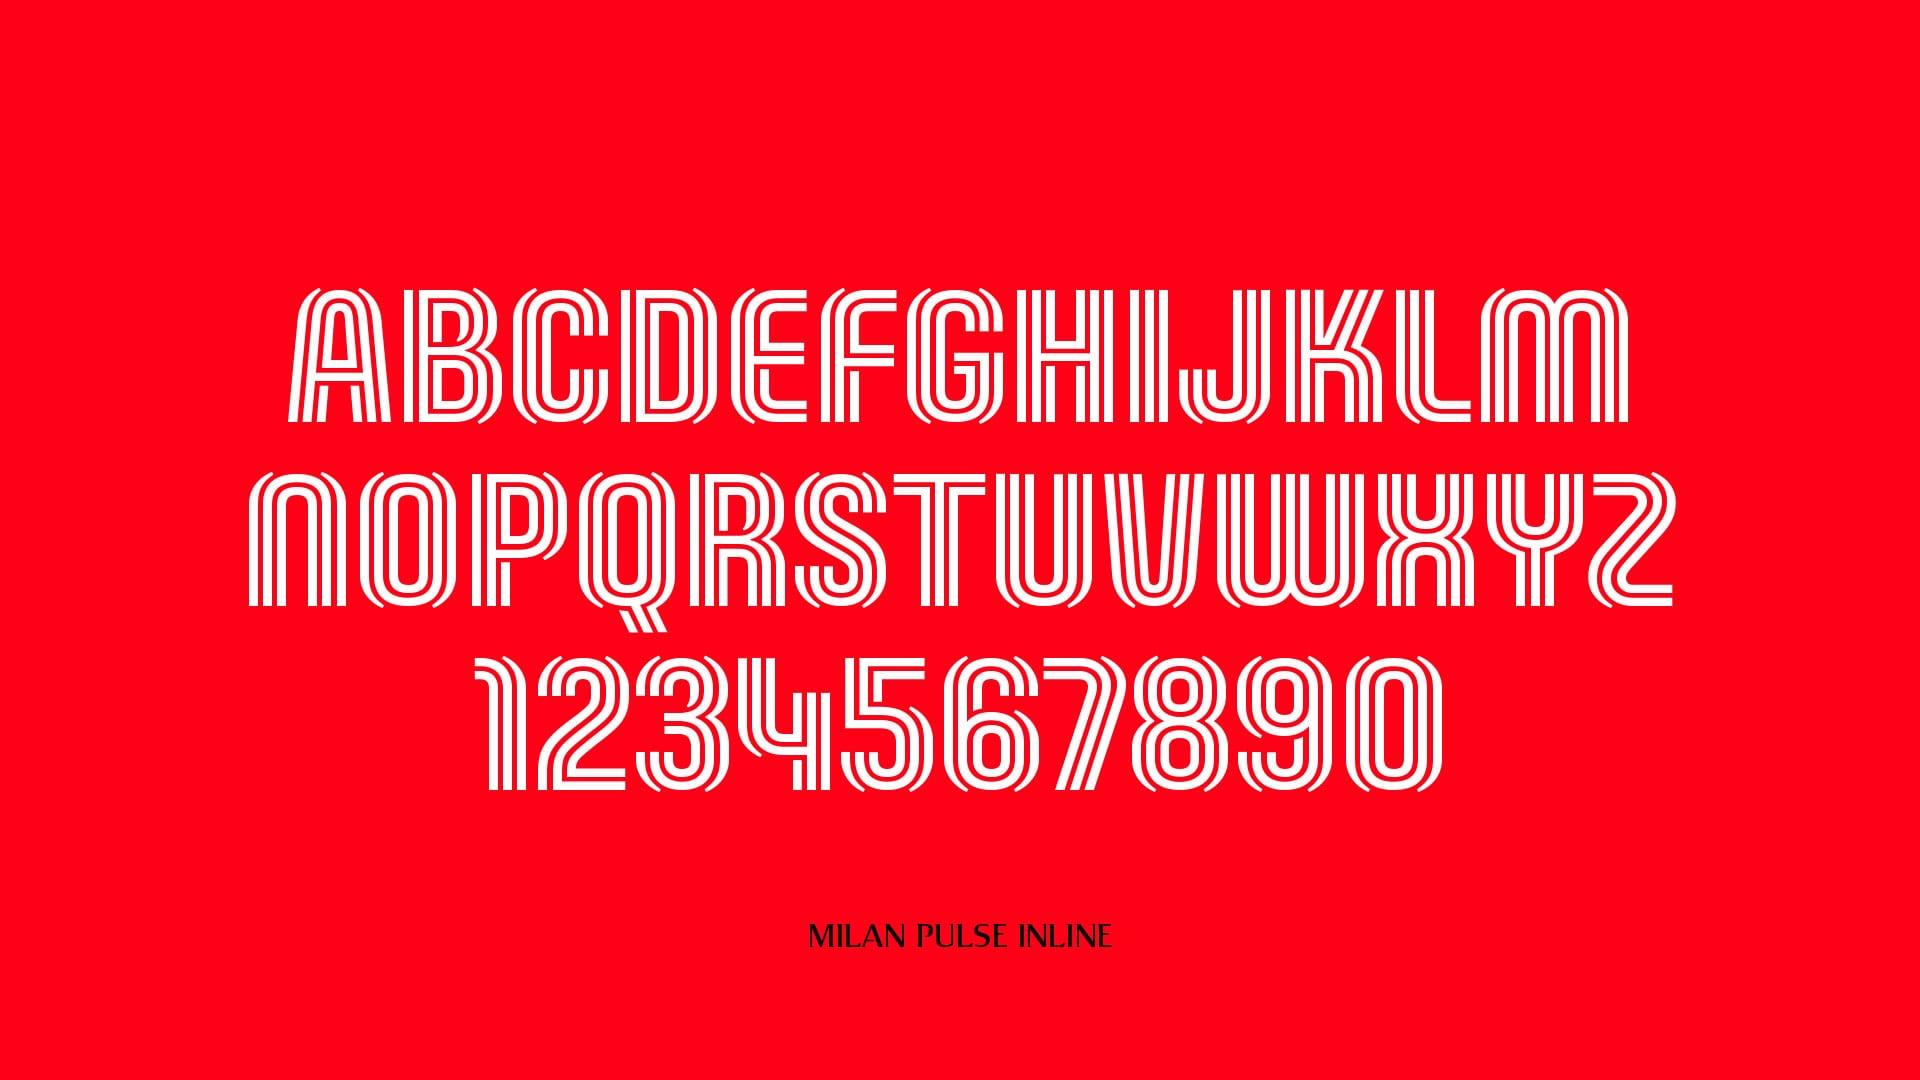 ac milan s novym logom aj custom fontom acbody4 1 - AC Milan s novým logom aj custom fontom